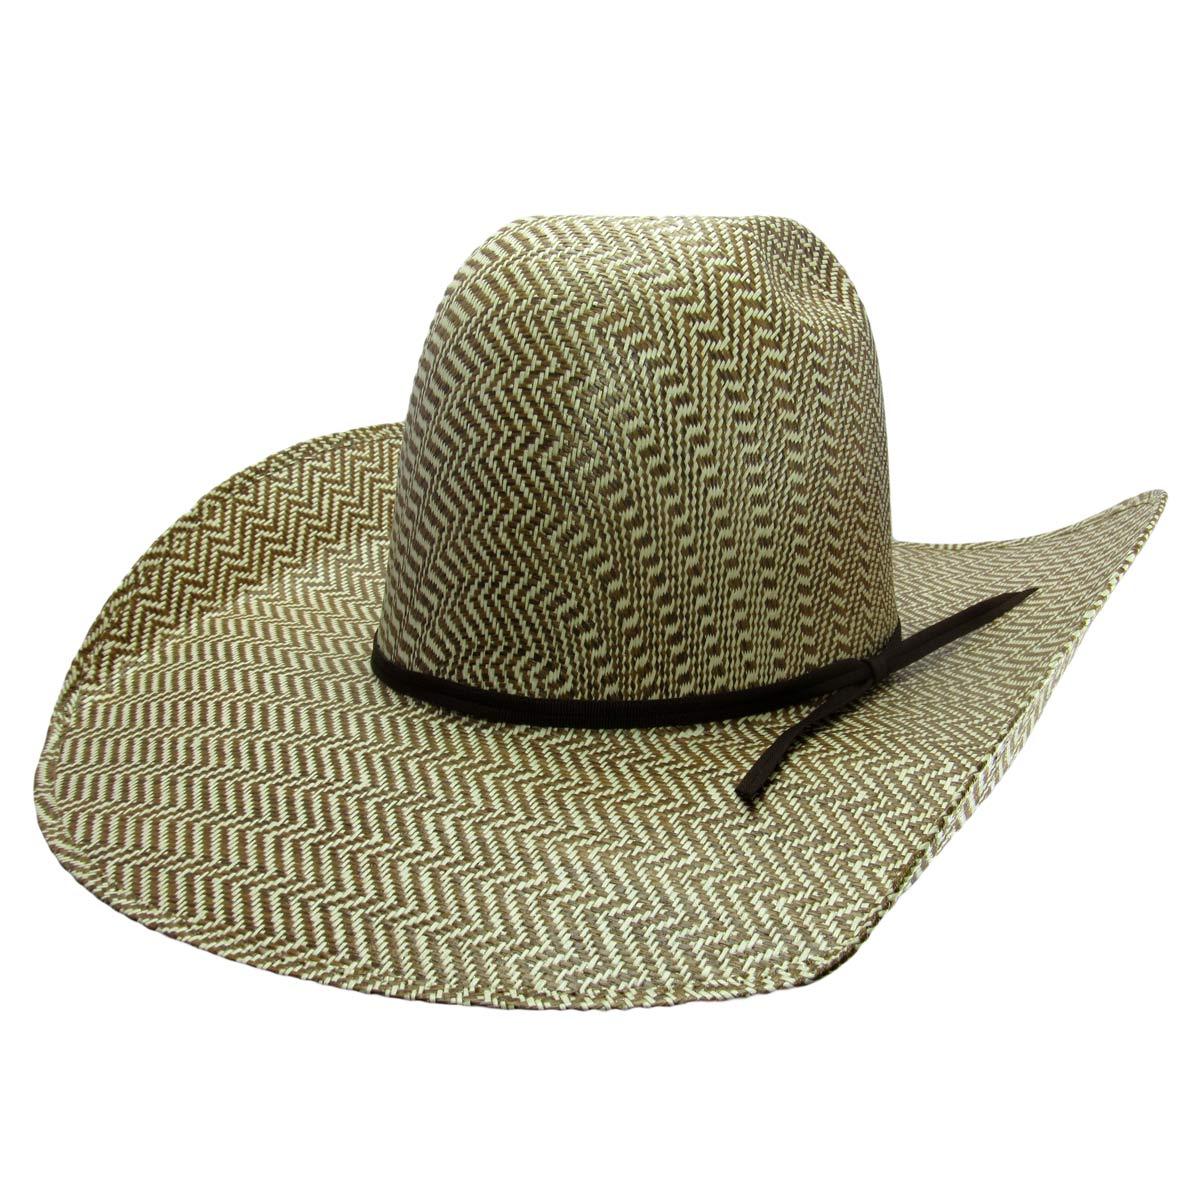 Chapéu Country Rodeio Texas Indian Valtierra Modelo N°2